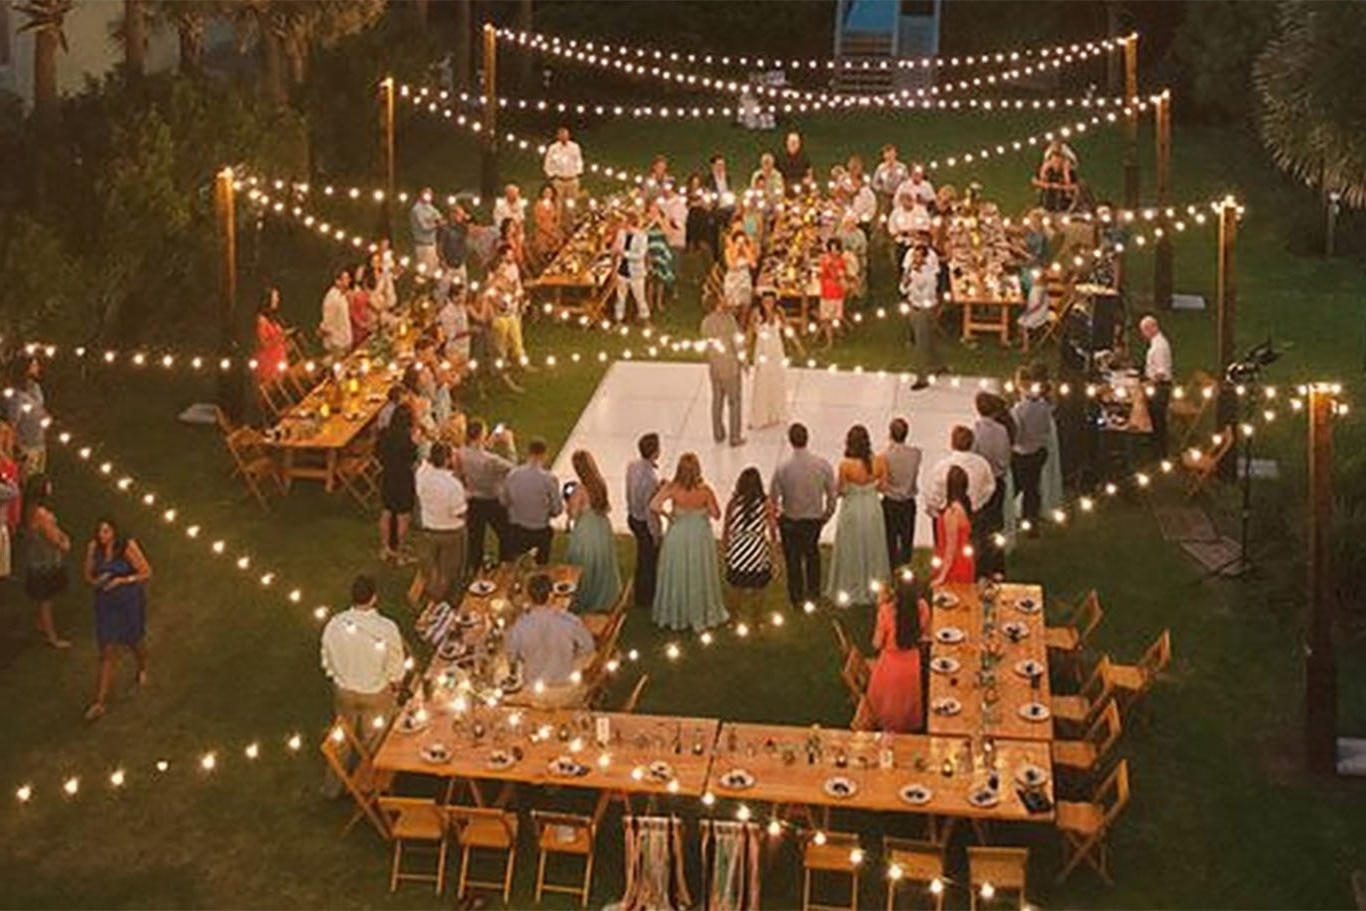 Famous Small Bedroom Size Beautiful Wedding Outdoor Lights Craluxlighting Regarding Outdoor Lanterns For Wedding (View 9 of 20)